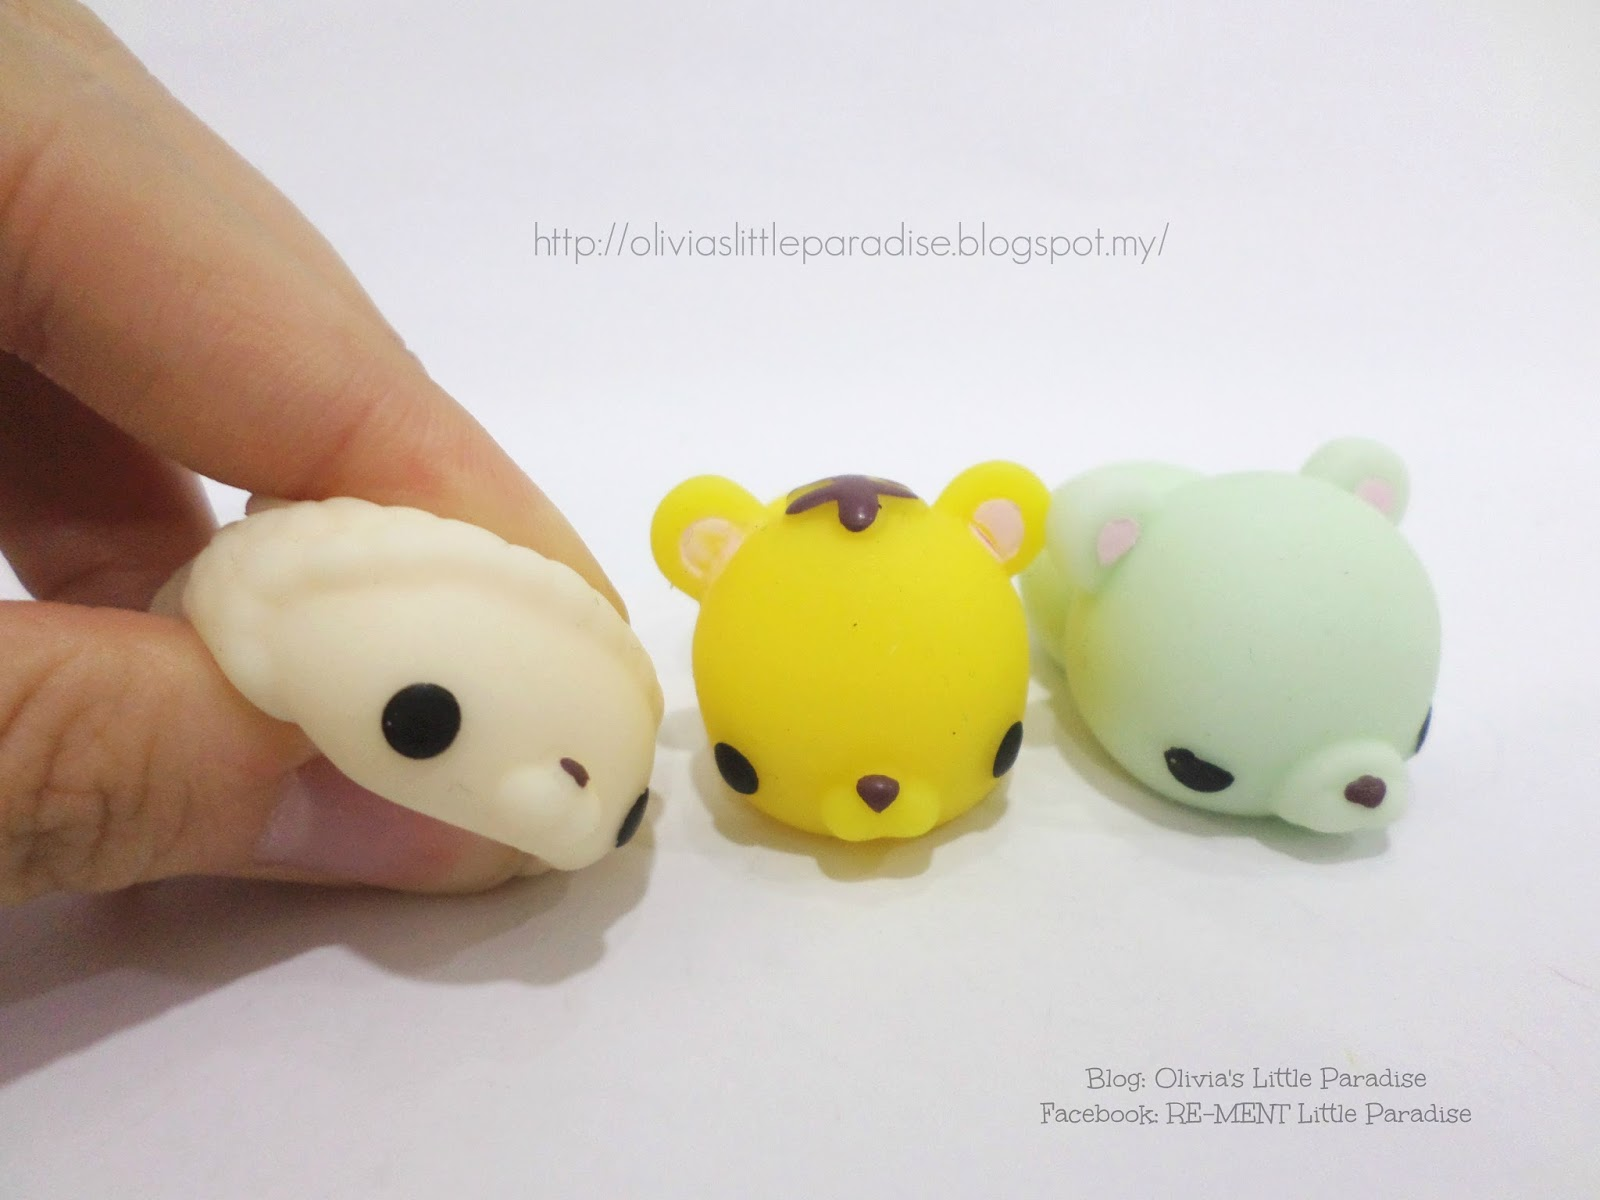 Squishy Little Animals : Olivia s Little Paradise: Moni Moni Animals Squishy #1